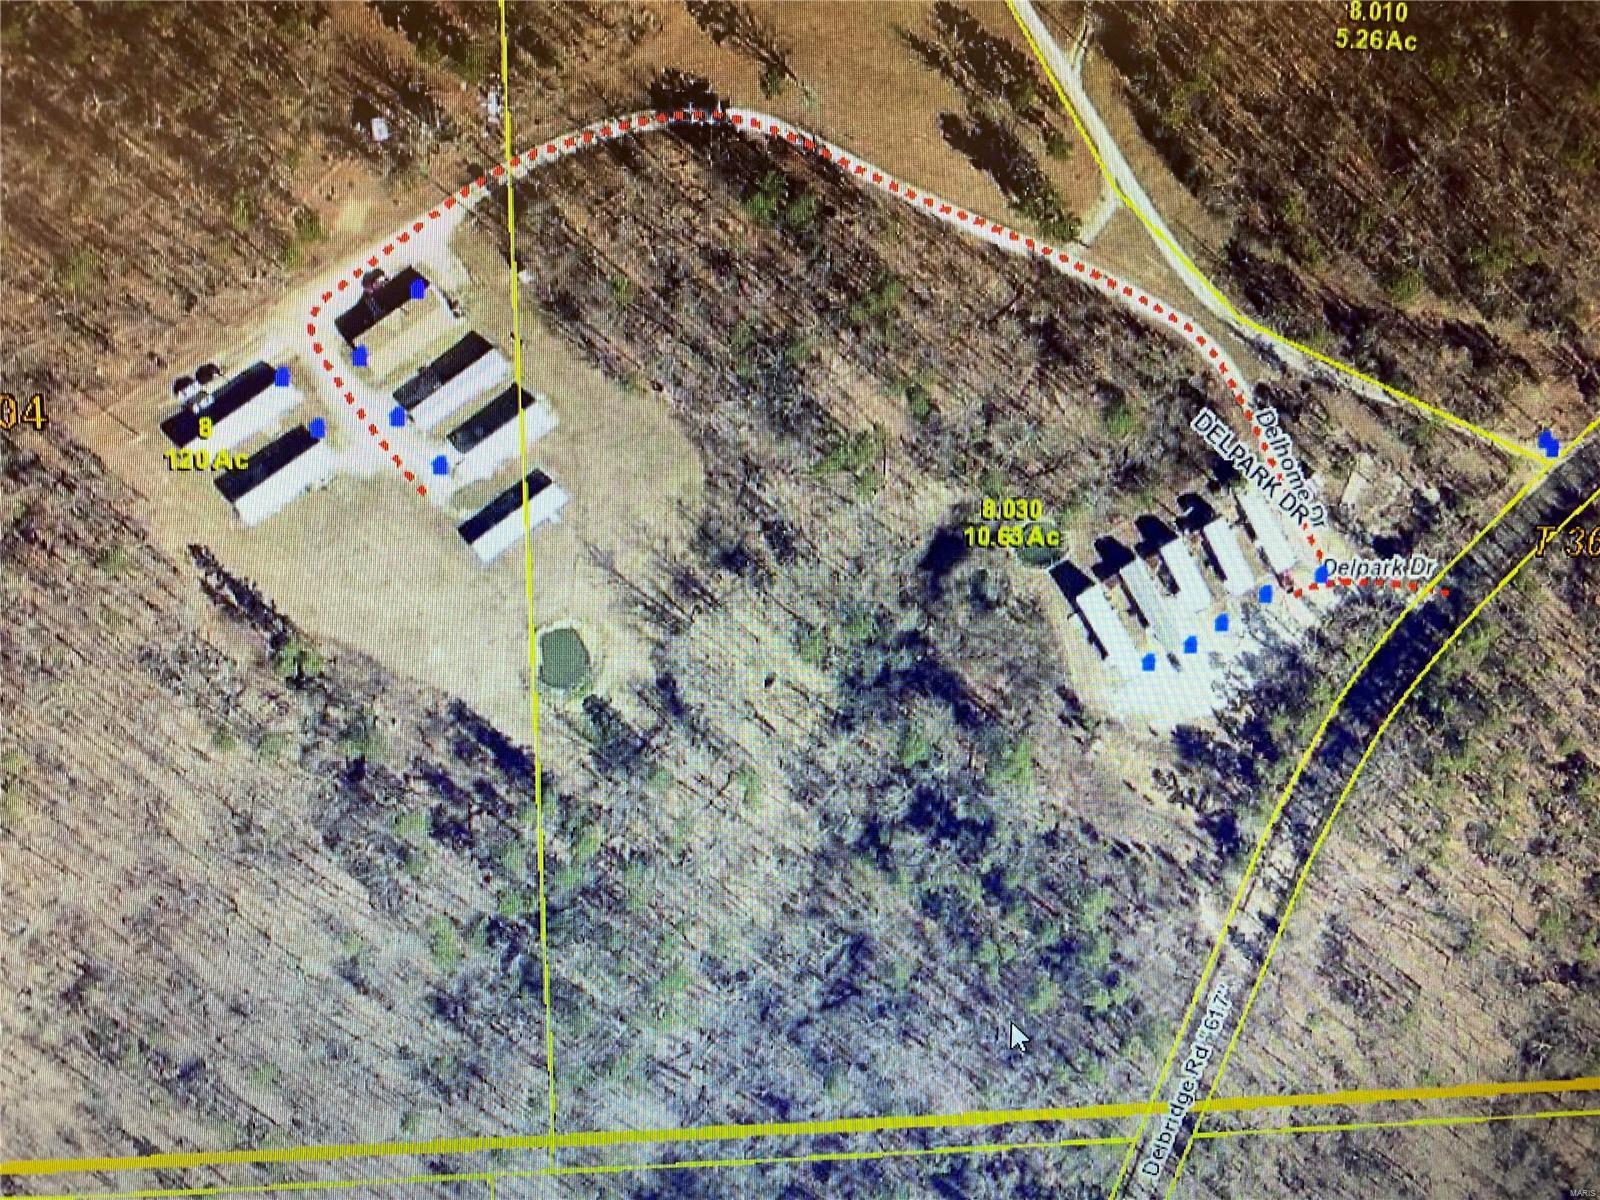 10053 Delpark Property Photo